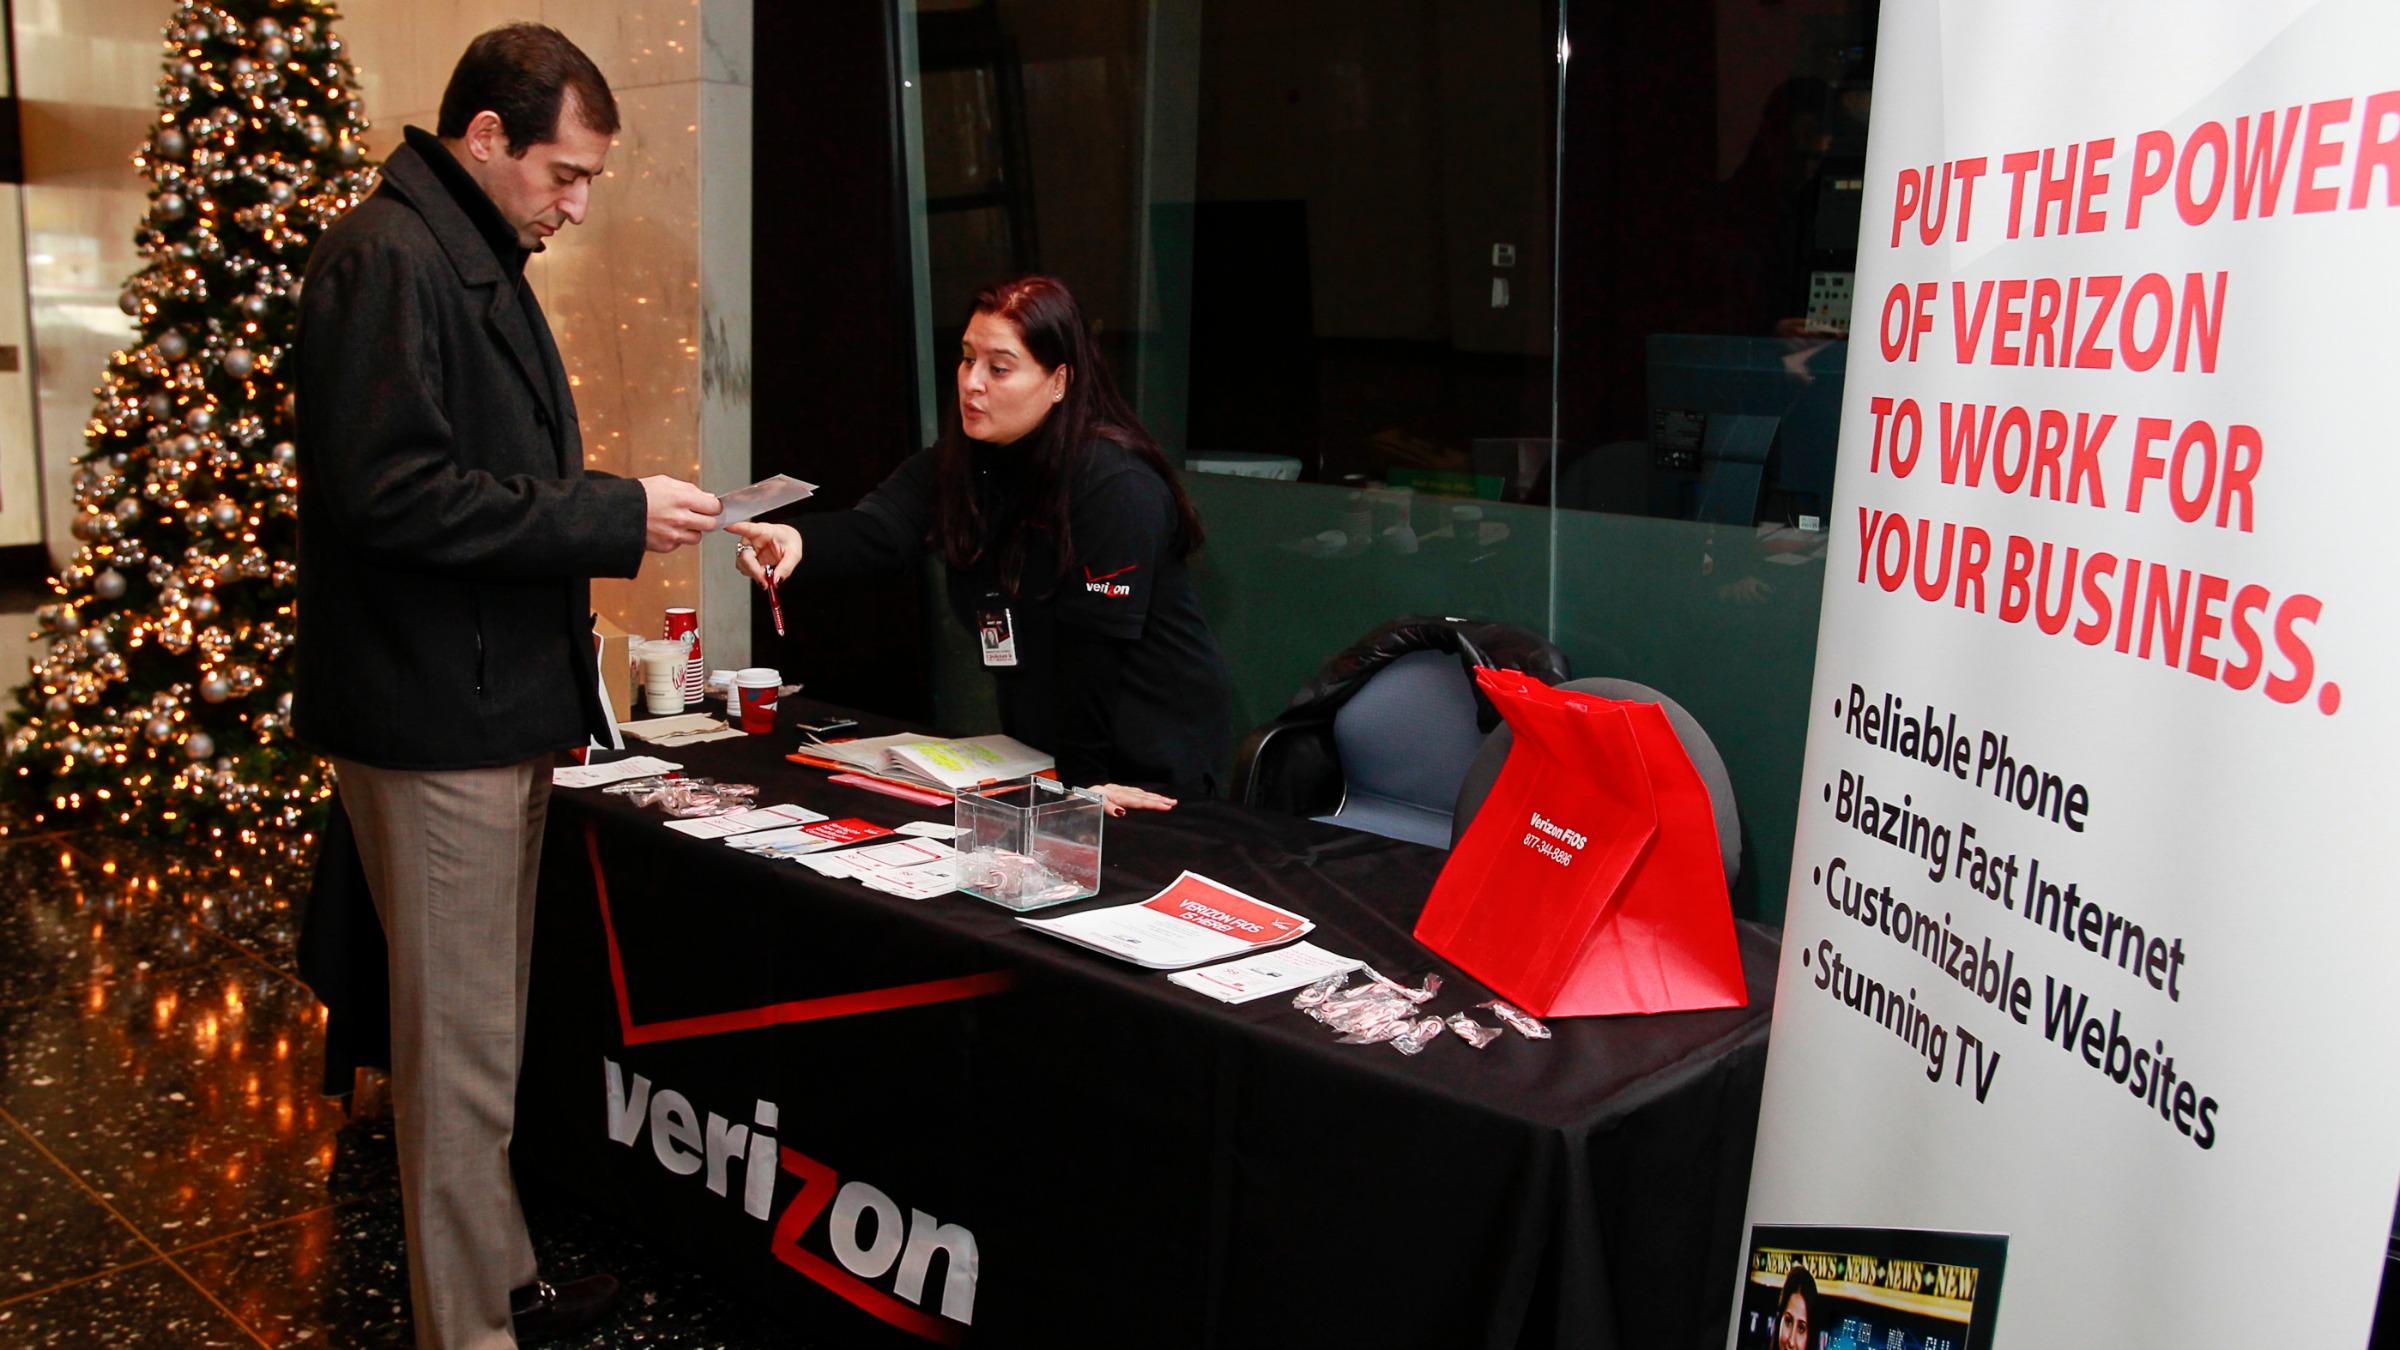 Verizon fios saleswoman